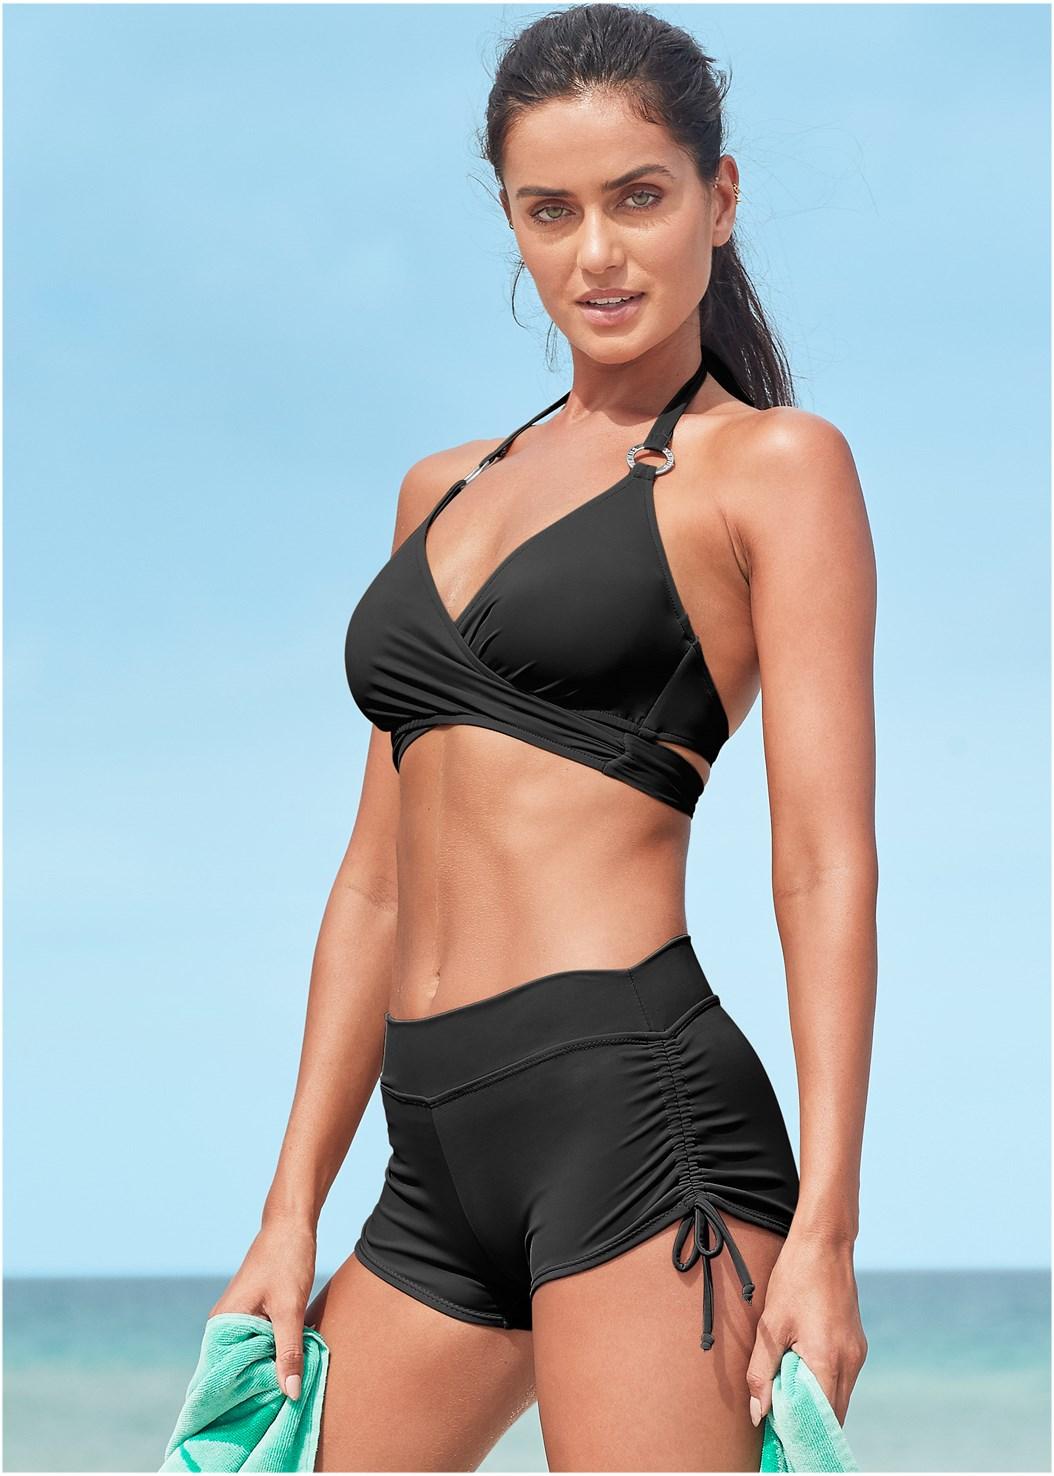 Underwire Wrap Top,Adjustable Side Swim Short,Sally Mid Rise Bottom,Scoop Front Classic Bikini Bottom ,Mid Rise Swim Skirt Bikini Bottom